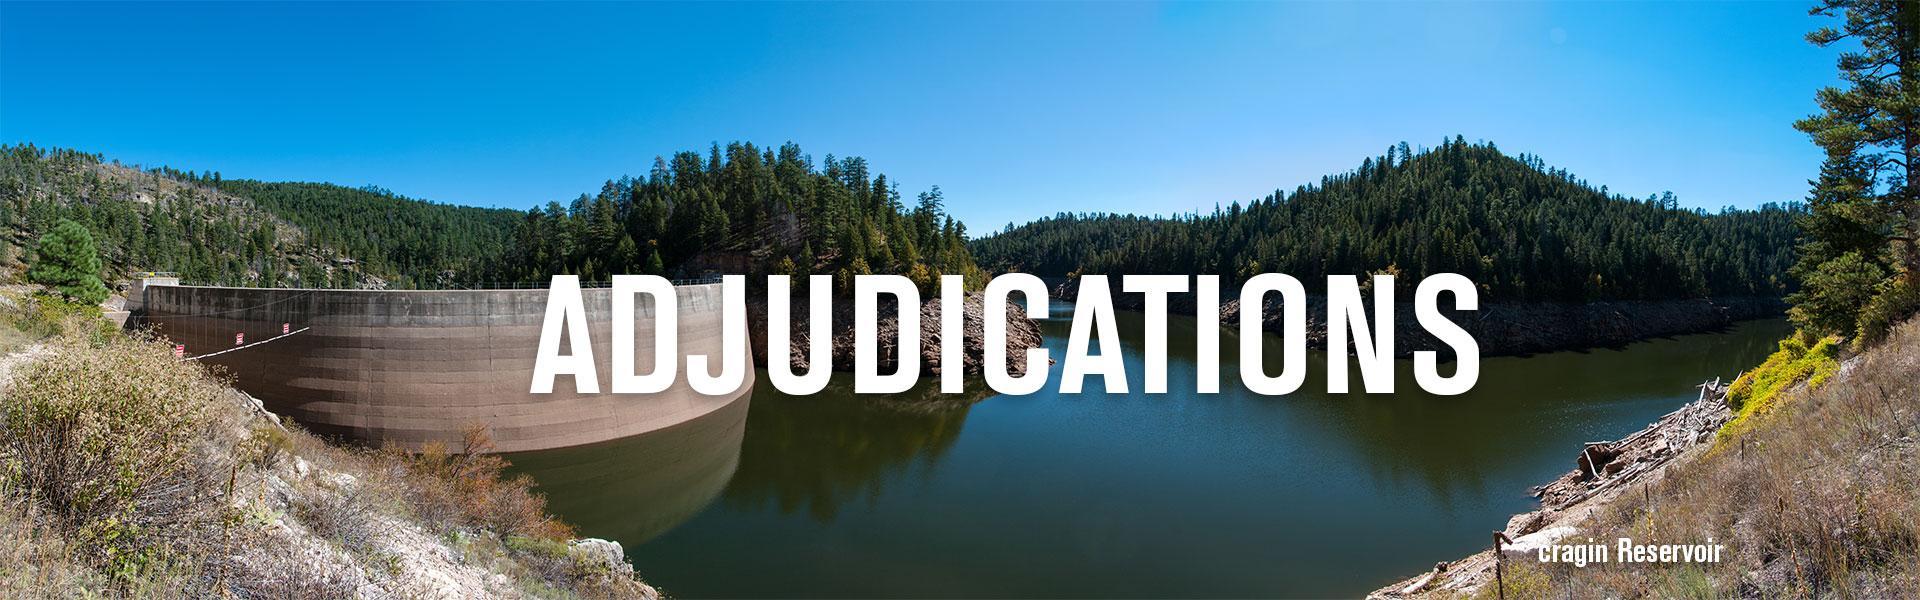 Adjudications banner